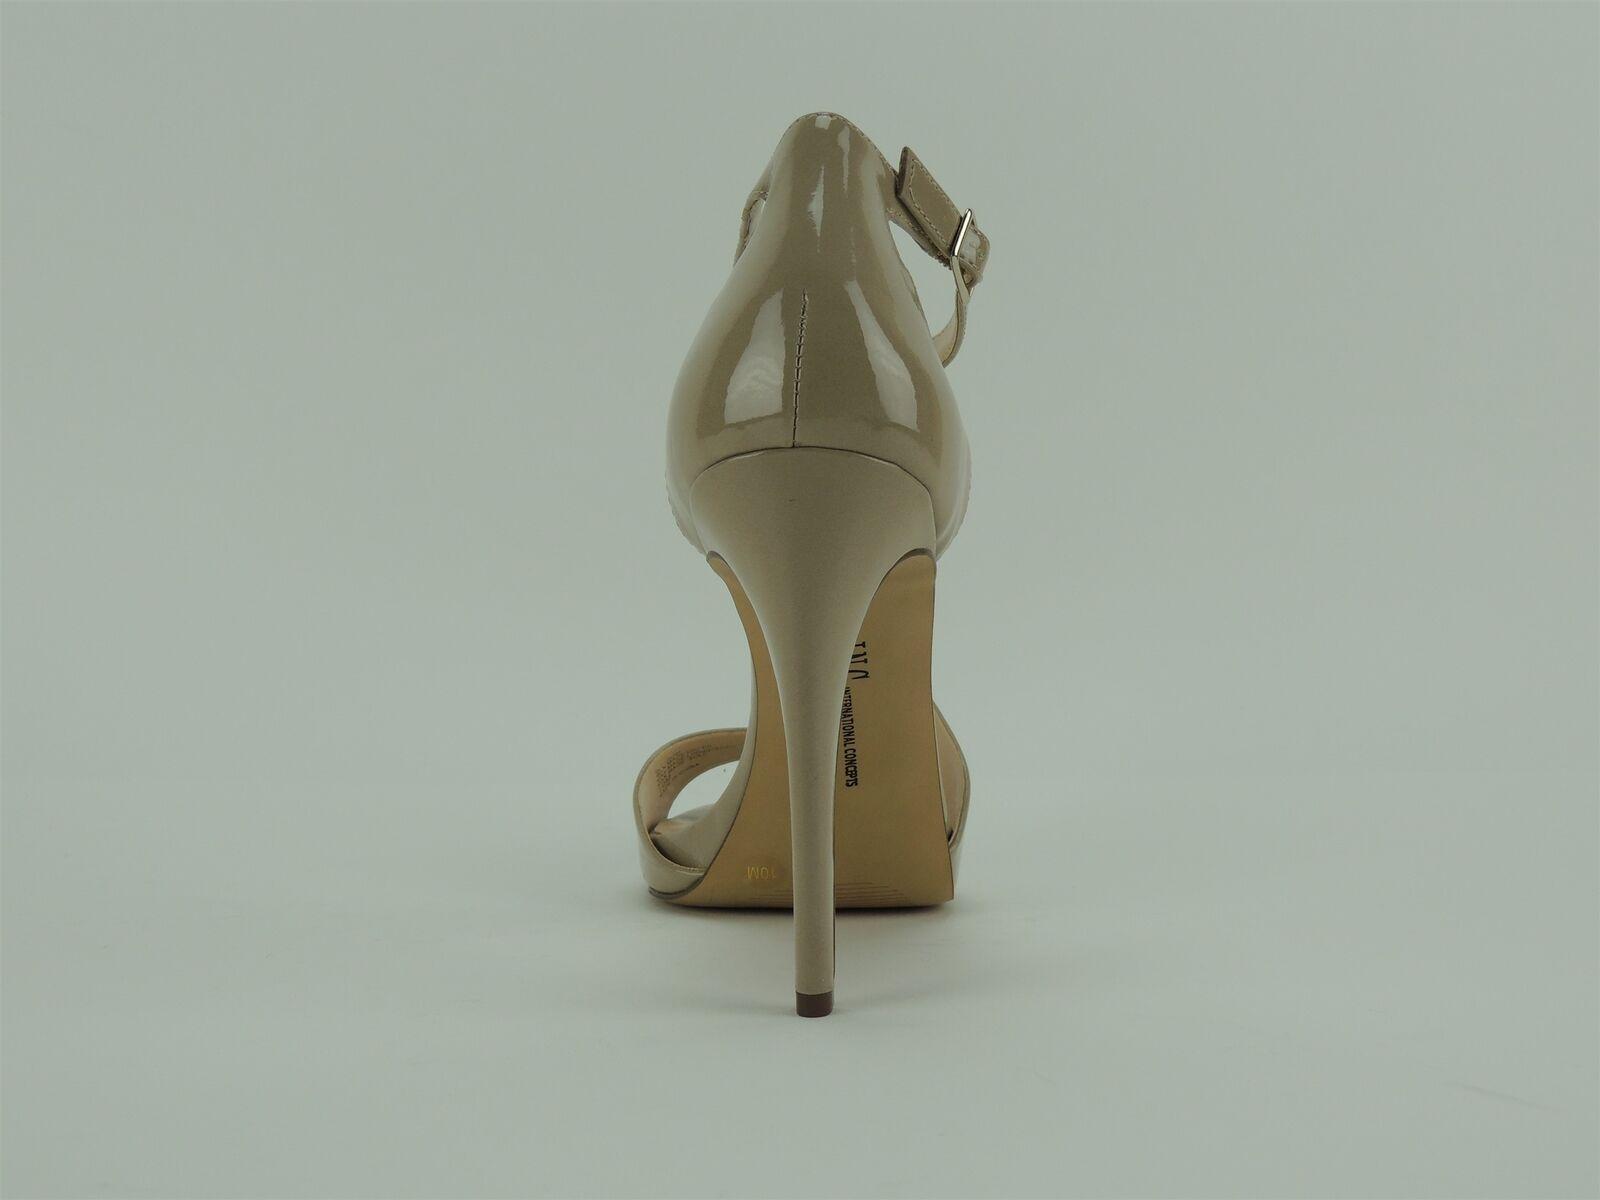 INC INC INC International Concepts Women's Suzi High Heel Platform Sandal Oatmeal 10 M 401d1c